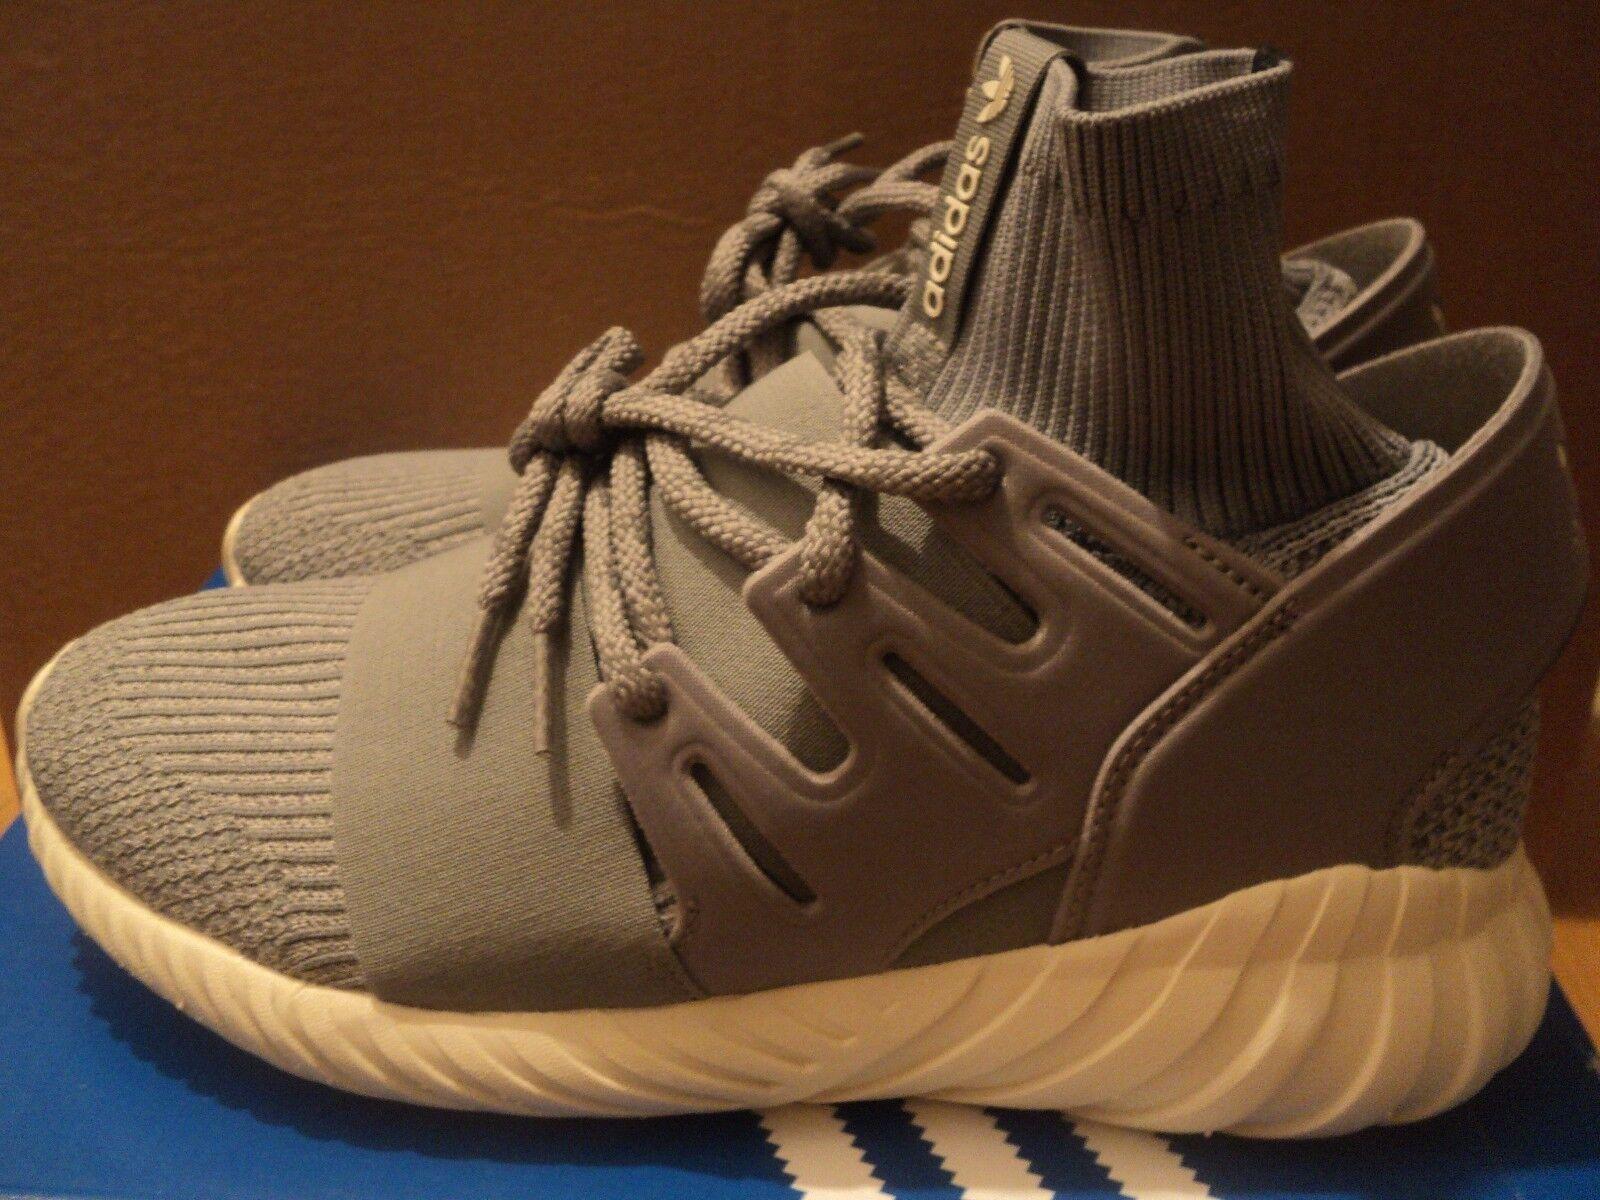 Adidas originals tubuläre doom - pk primeknit größe = 8,5 - brand new in box -